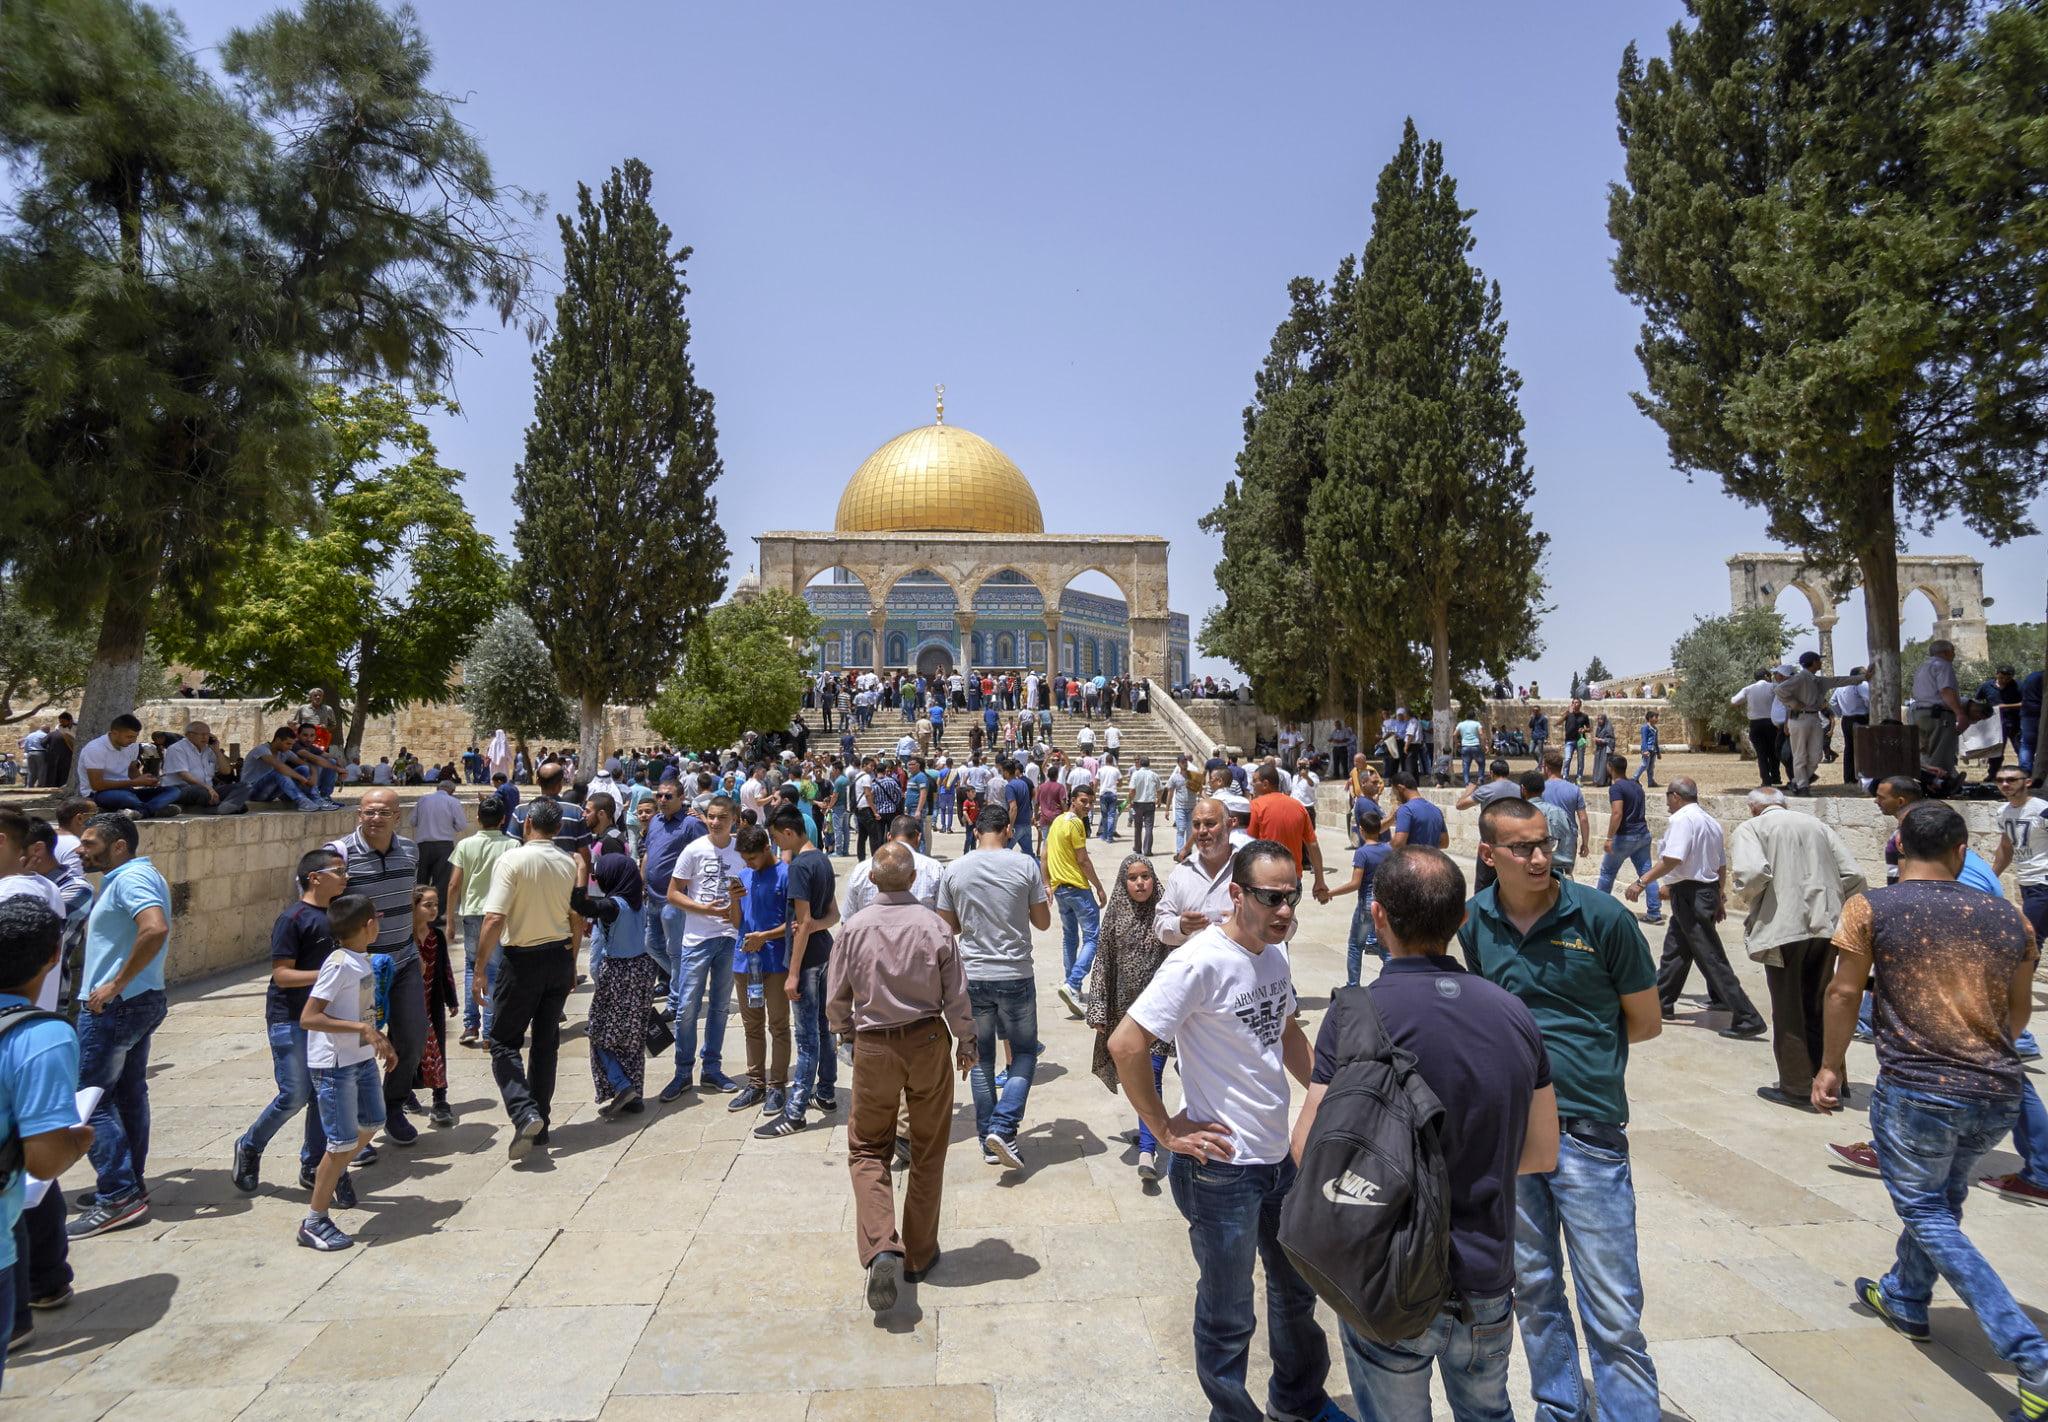 Israel Allows Muslim Public Prayer Gatherings During Pandemic